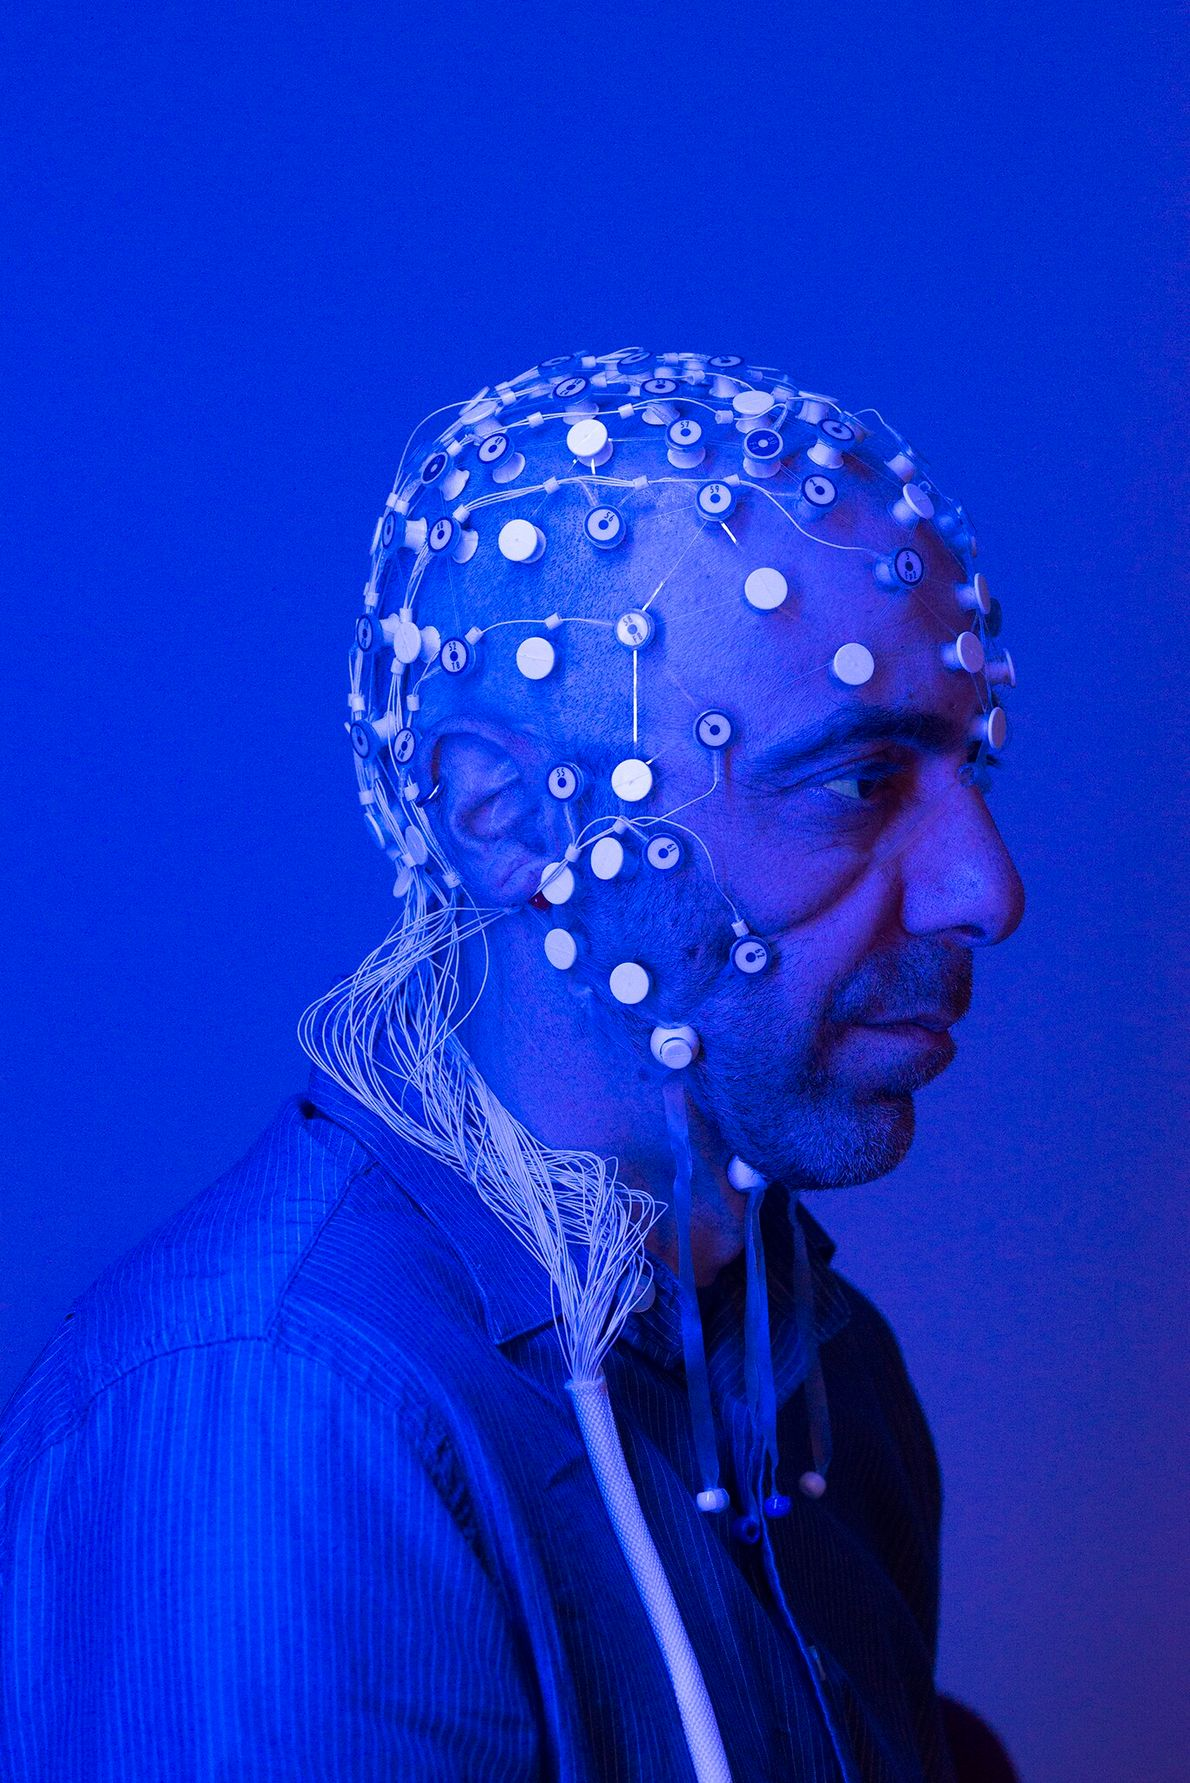 Vitaly Napadow, a neuroscientist at Harvard Medical School and Massachusetts General Hospital, studies how the brain ...